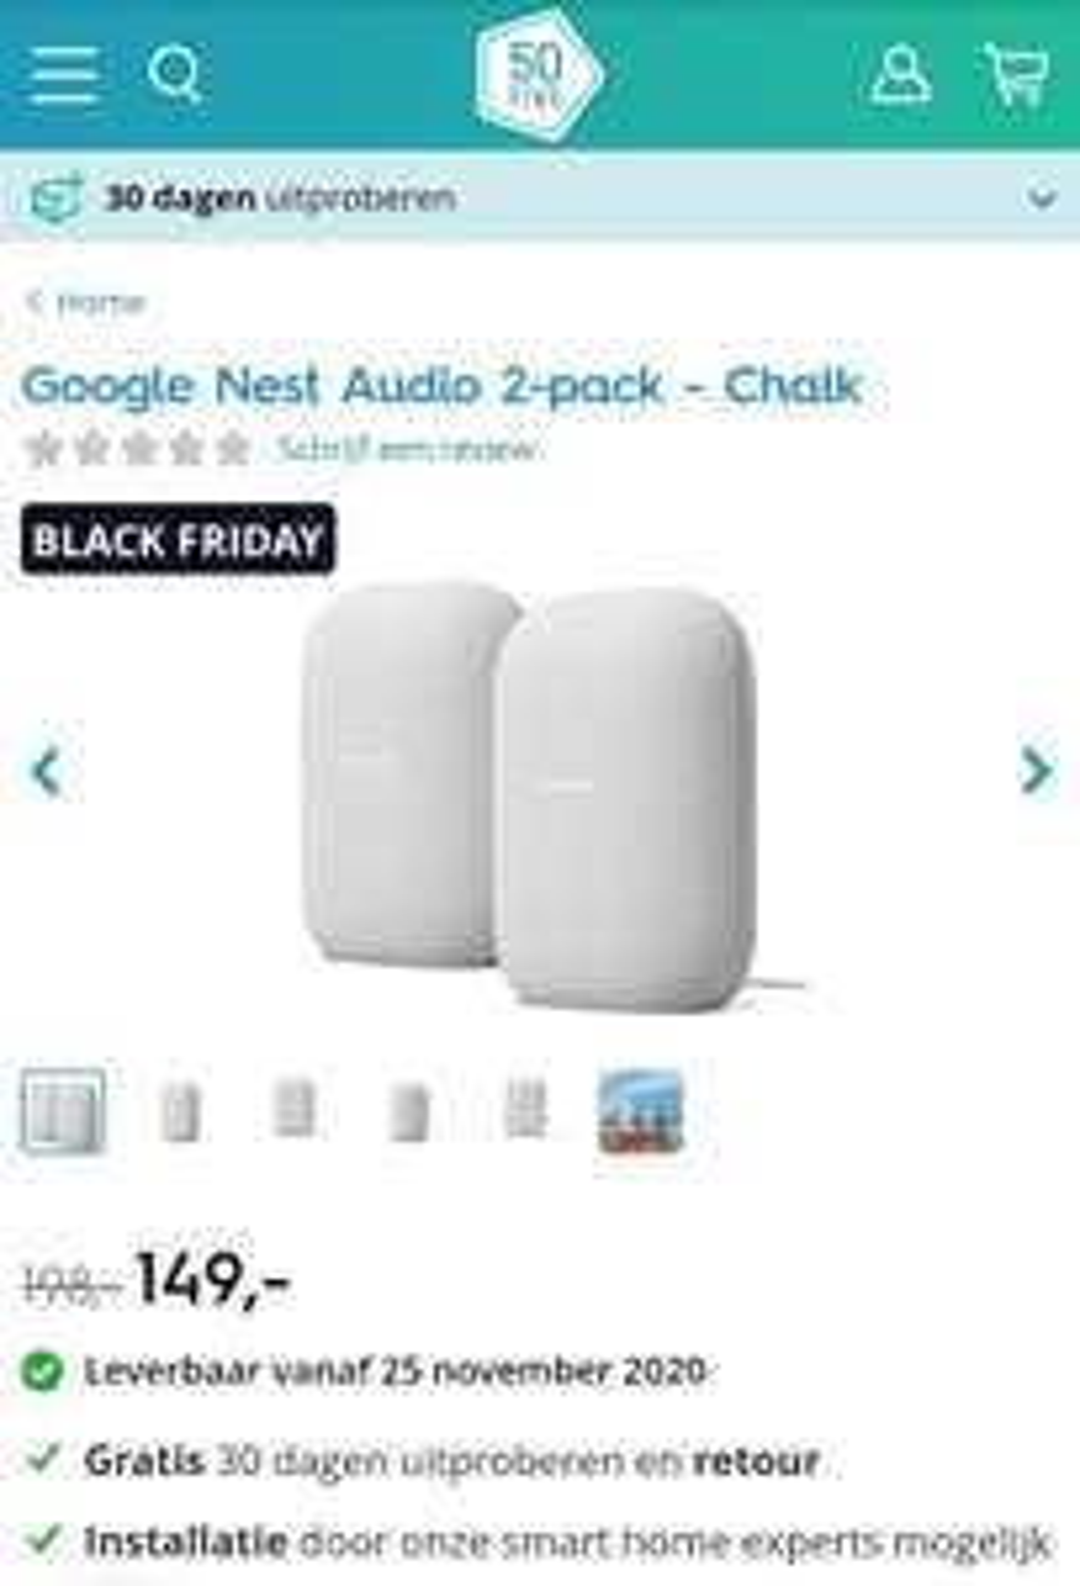 Google Nest Audio 2-pack